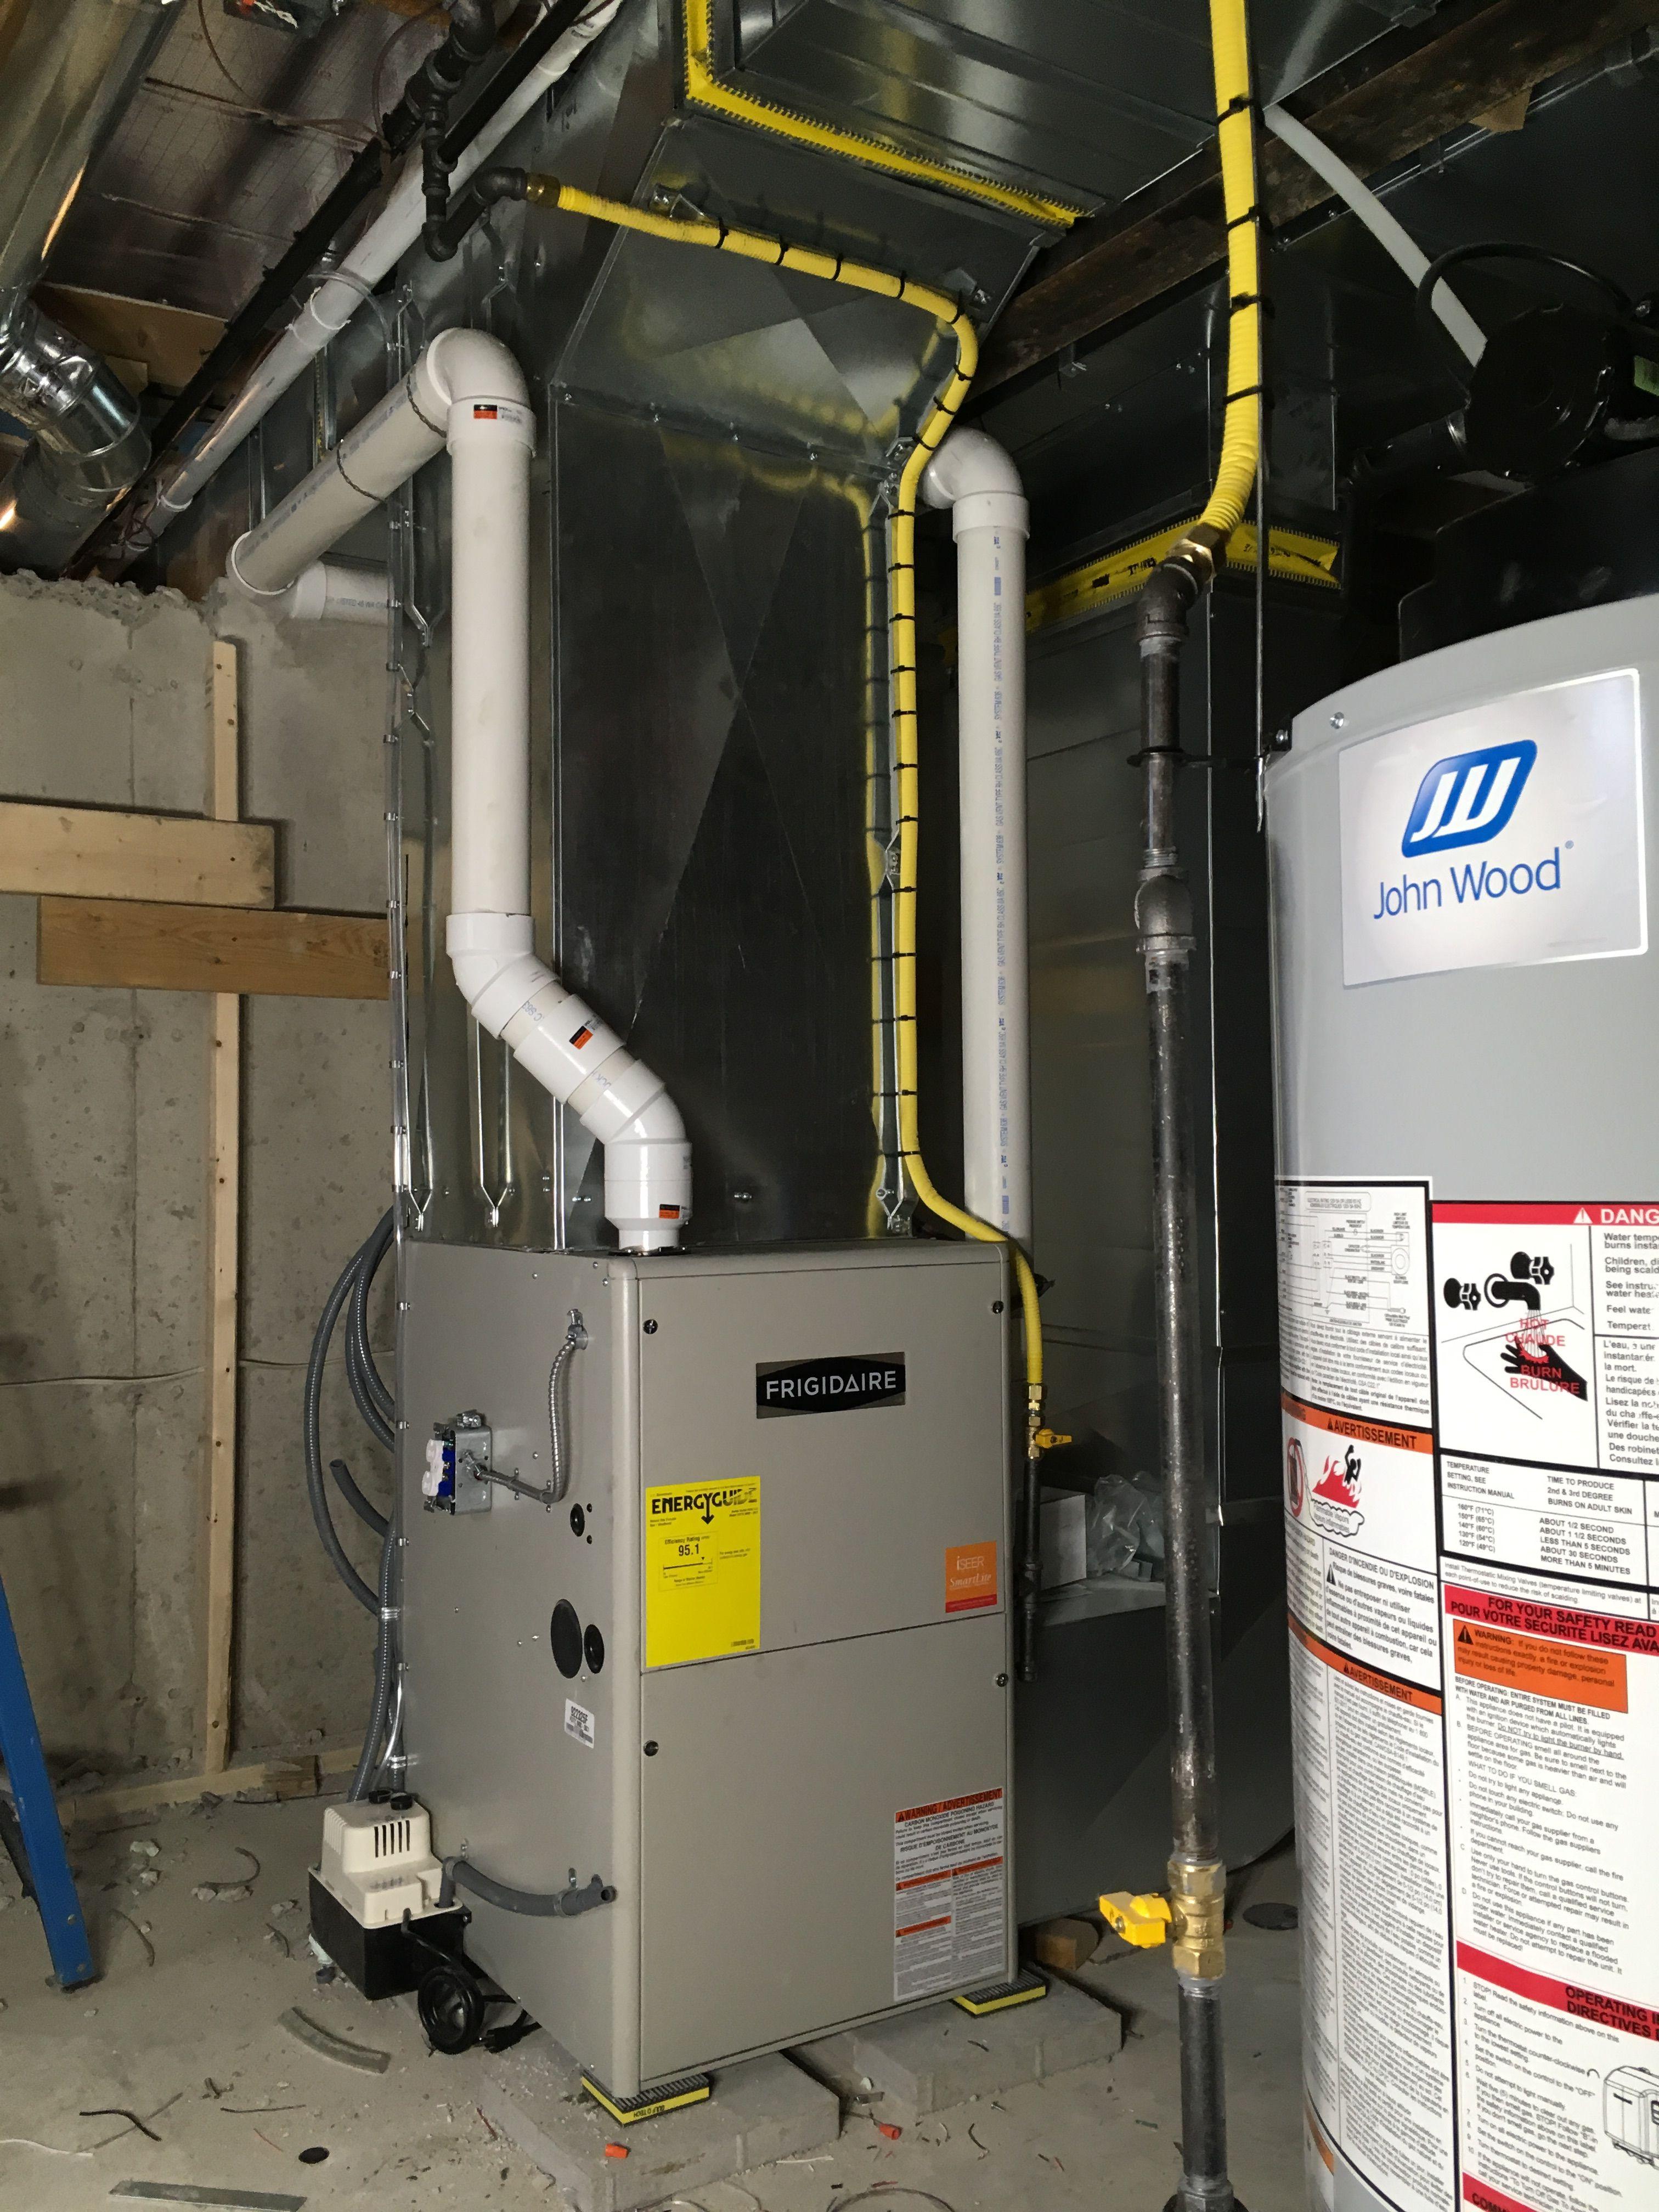 95Afue, two stage propane Frigidaire furnace 80,000 Btu